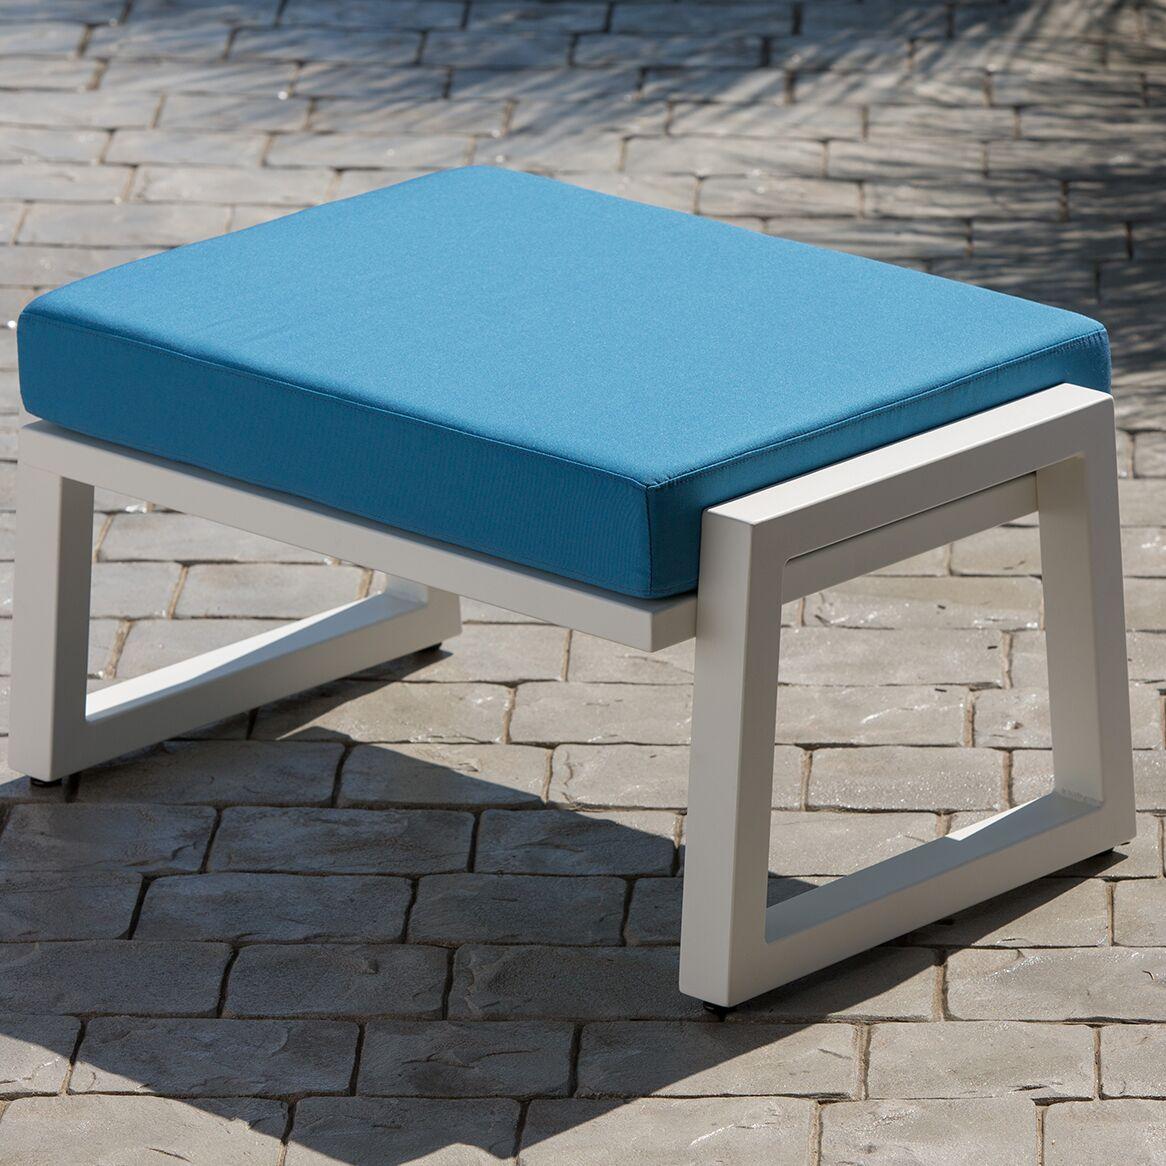 Vero Ottoman with Cushion Fabric: Sky Blue, Finish: Textured Black